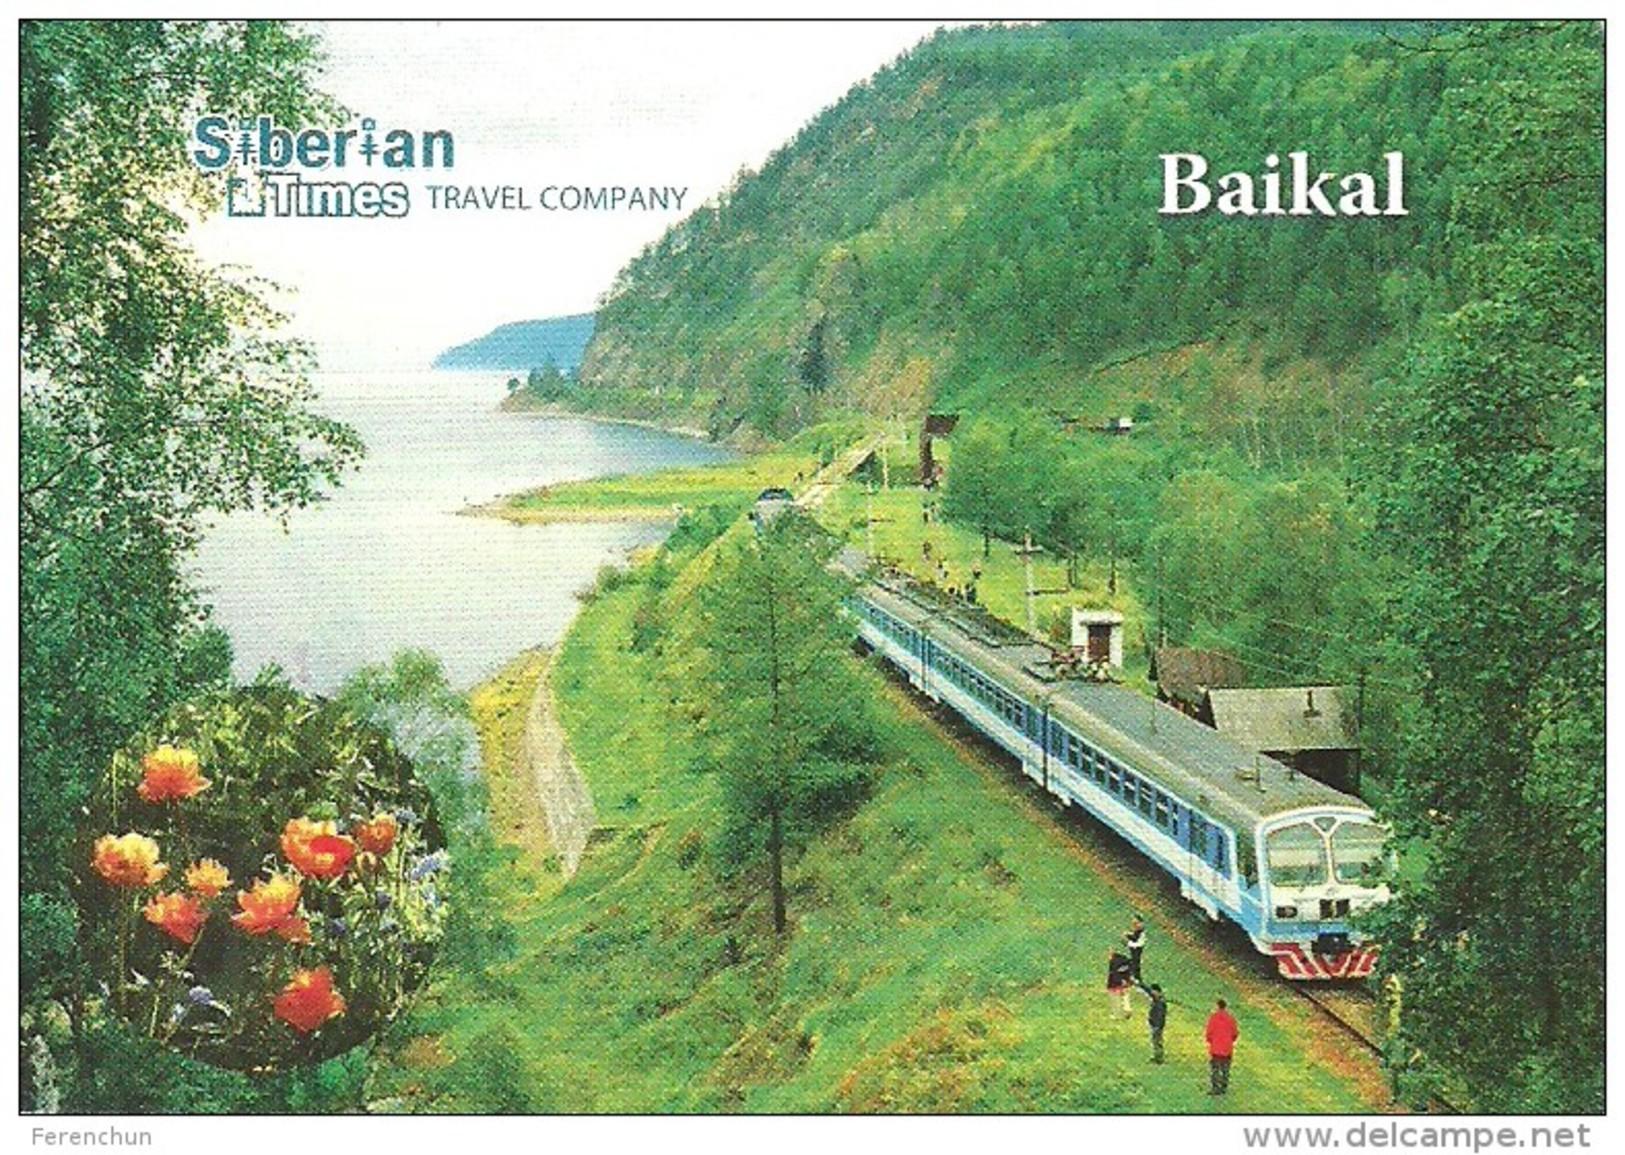 RAIL * RAILWAY * RAILROAD * TRAIN * RAILCAR * LAKE BAIKAL * IRKUTSK * SIBERIA * CALENDAR * Siberian Times 2015 * Russia - Formato Piccolo : 2001-...